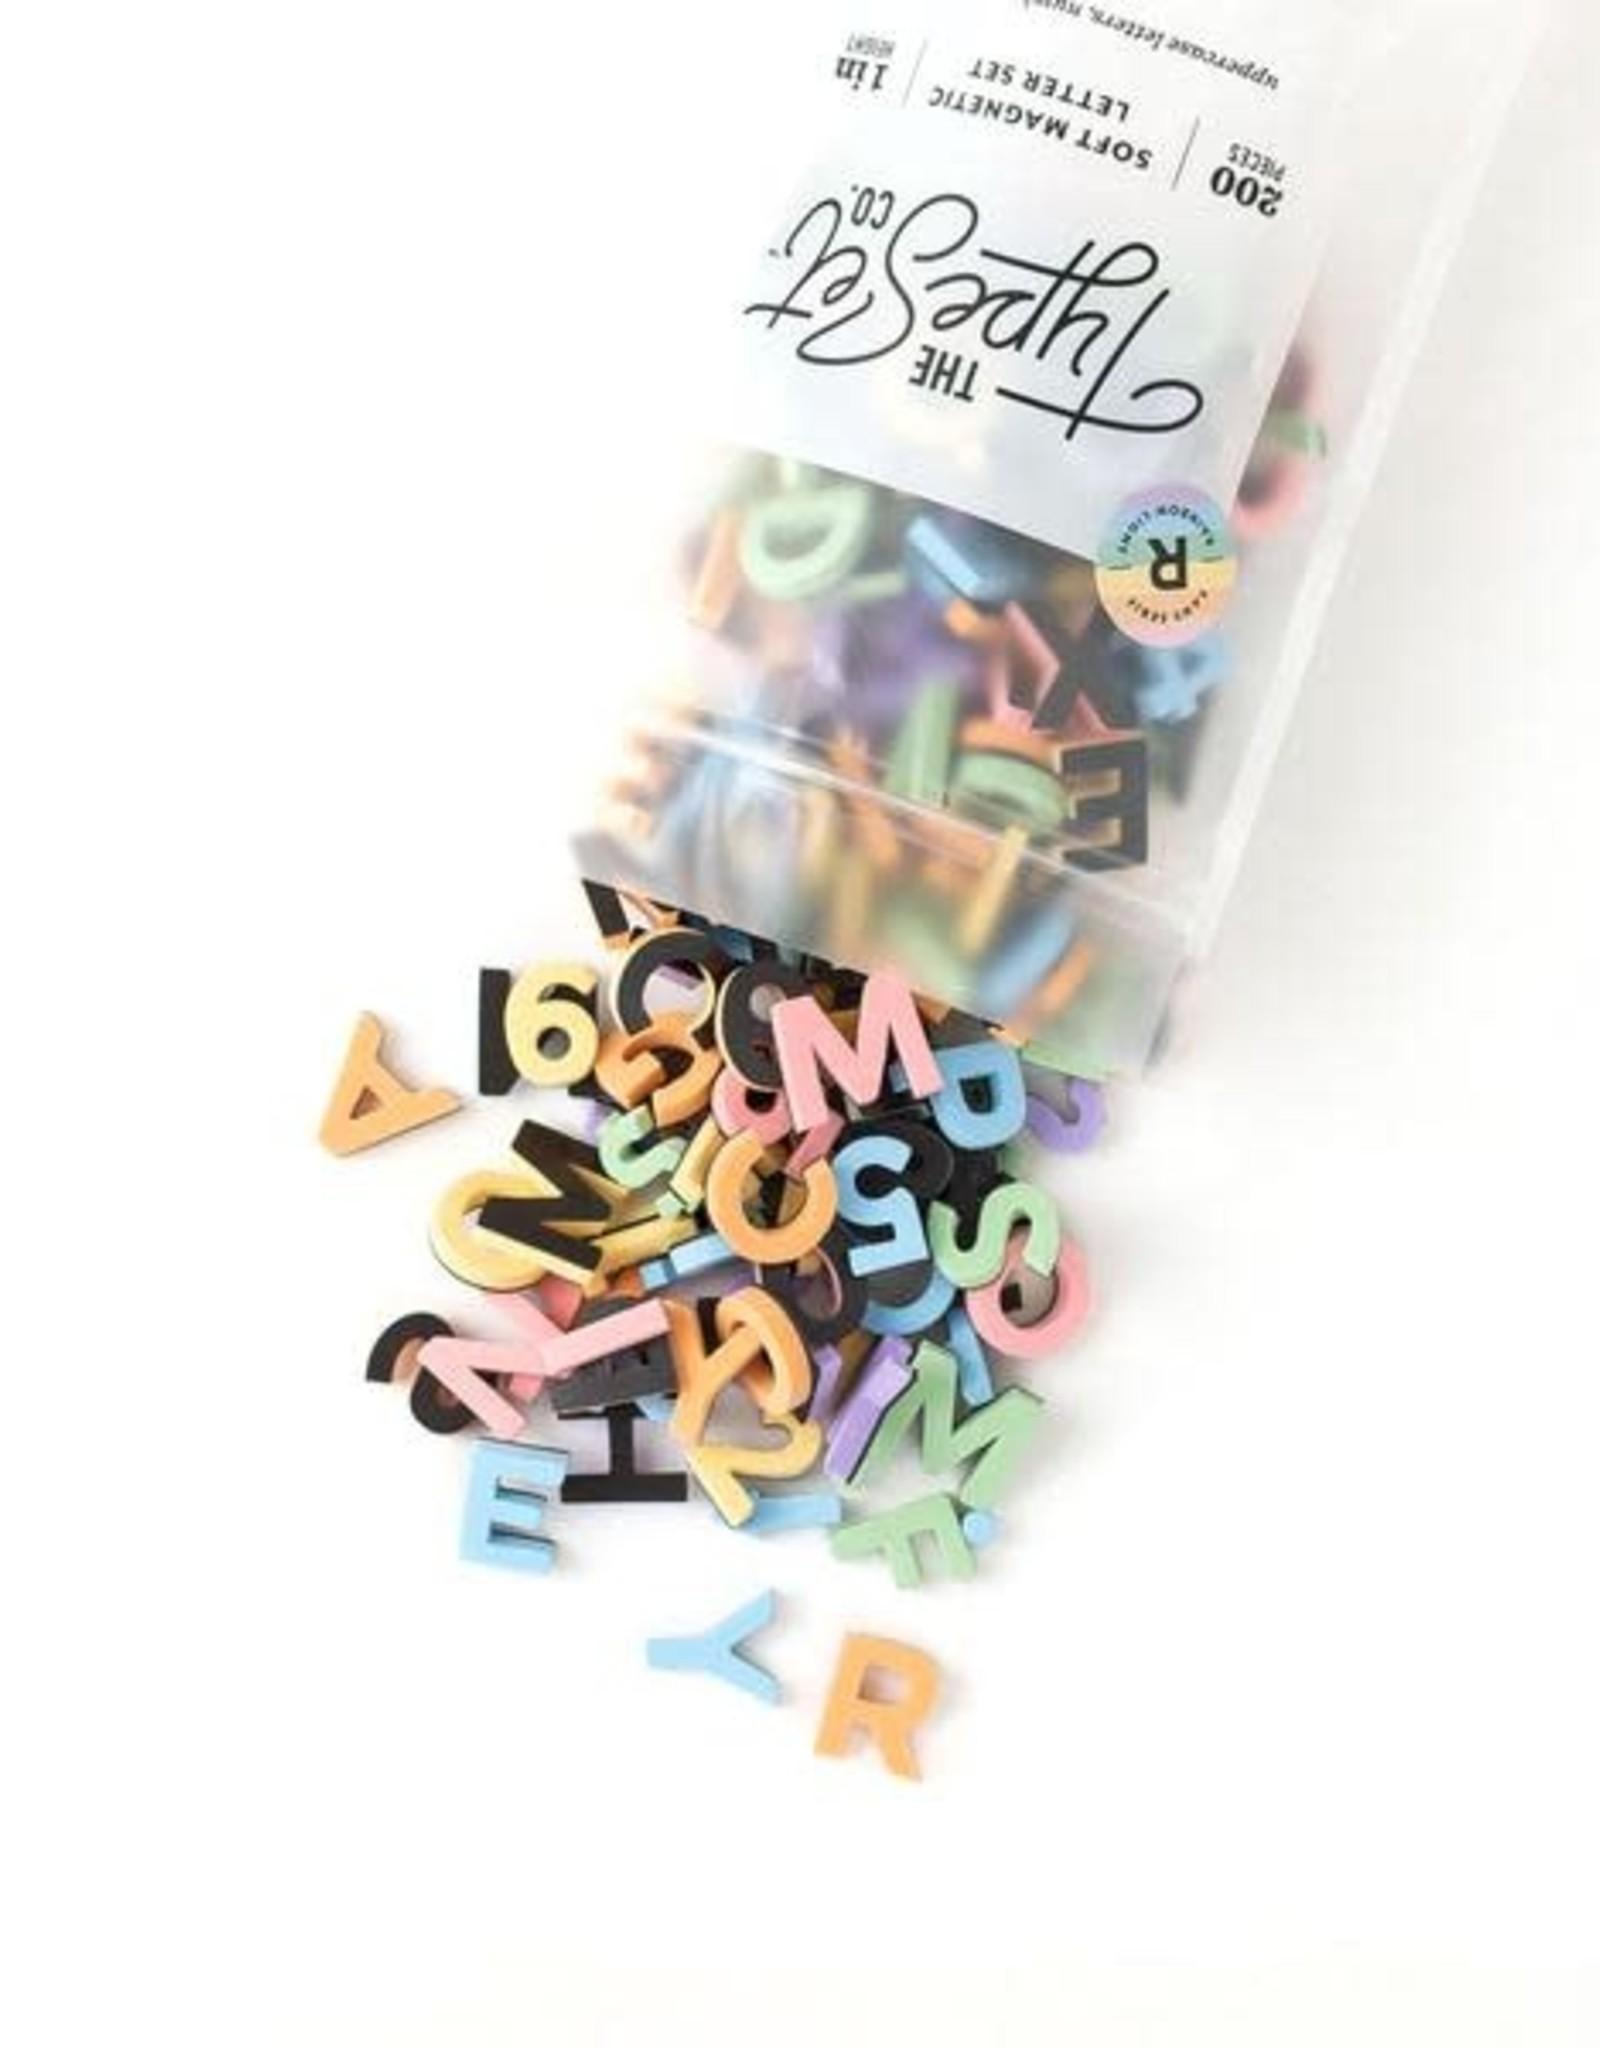 The Type Set Rainbow light letters